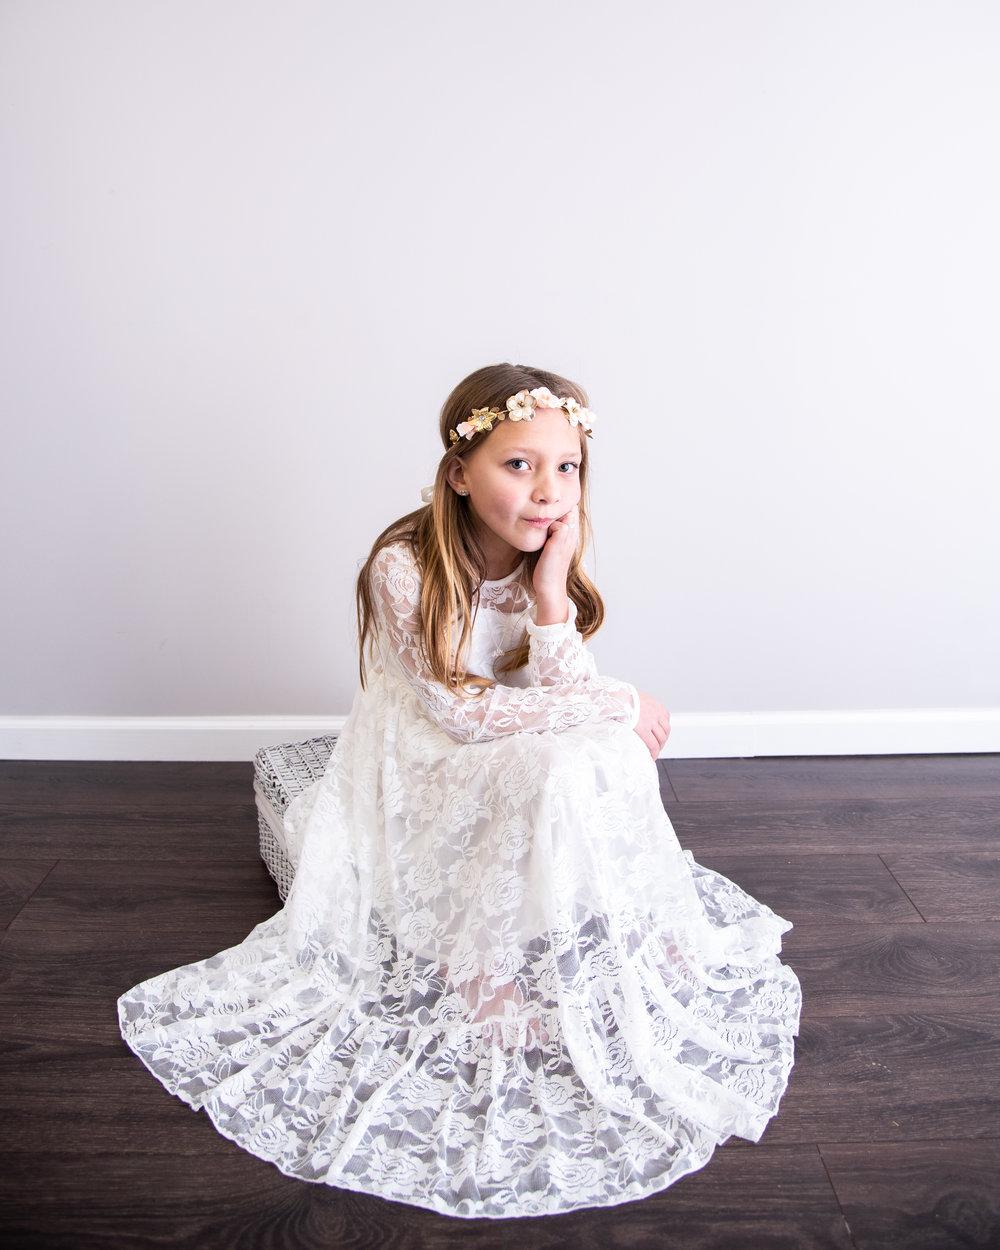 Kyla Jo Photography // Muncie, Indiana Photographer // Indiana Photographer // Midwest Photographer // 8 year old portraits // kids in studio // kids photos